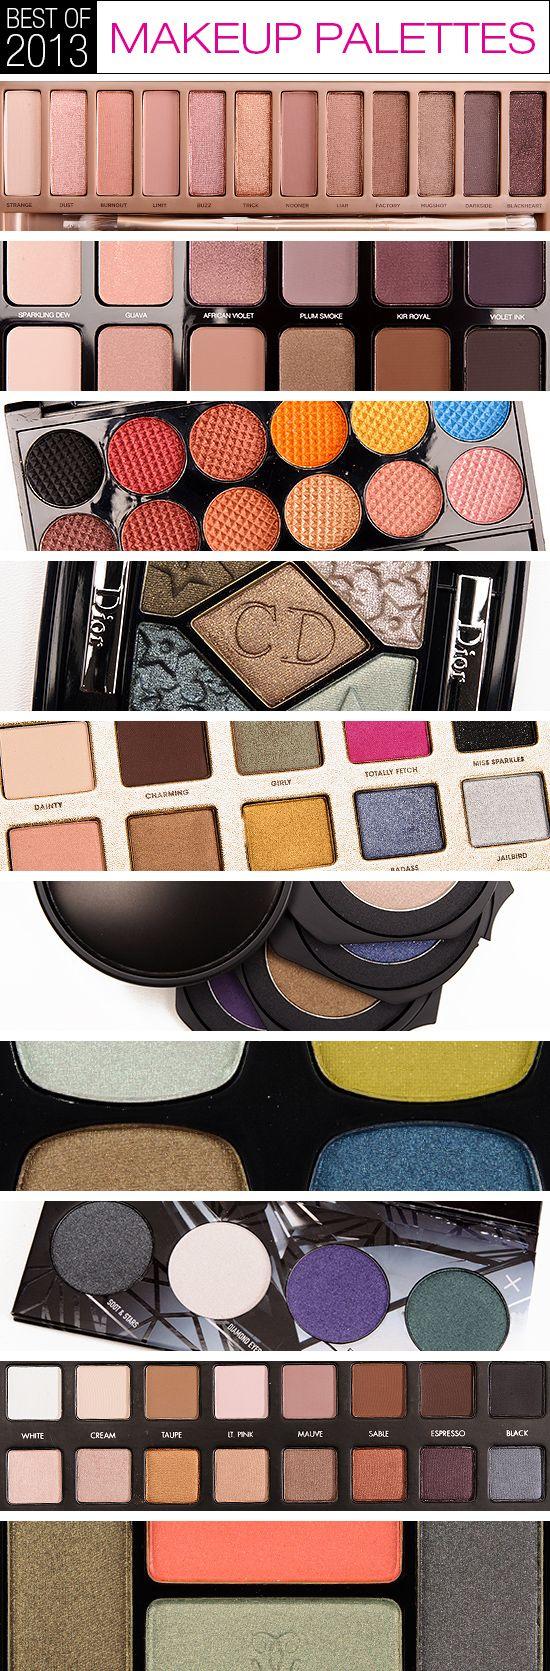 Top 10 of 2013: Best Makeup Palettes